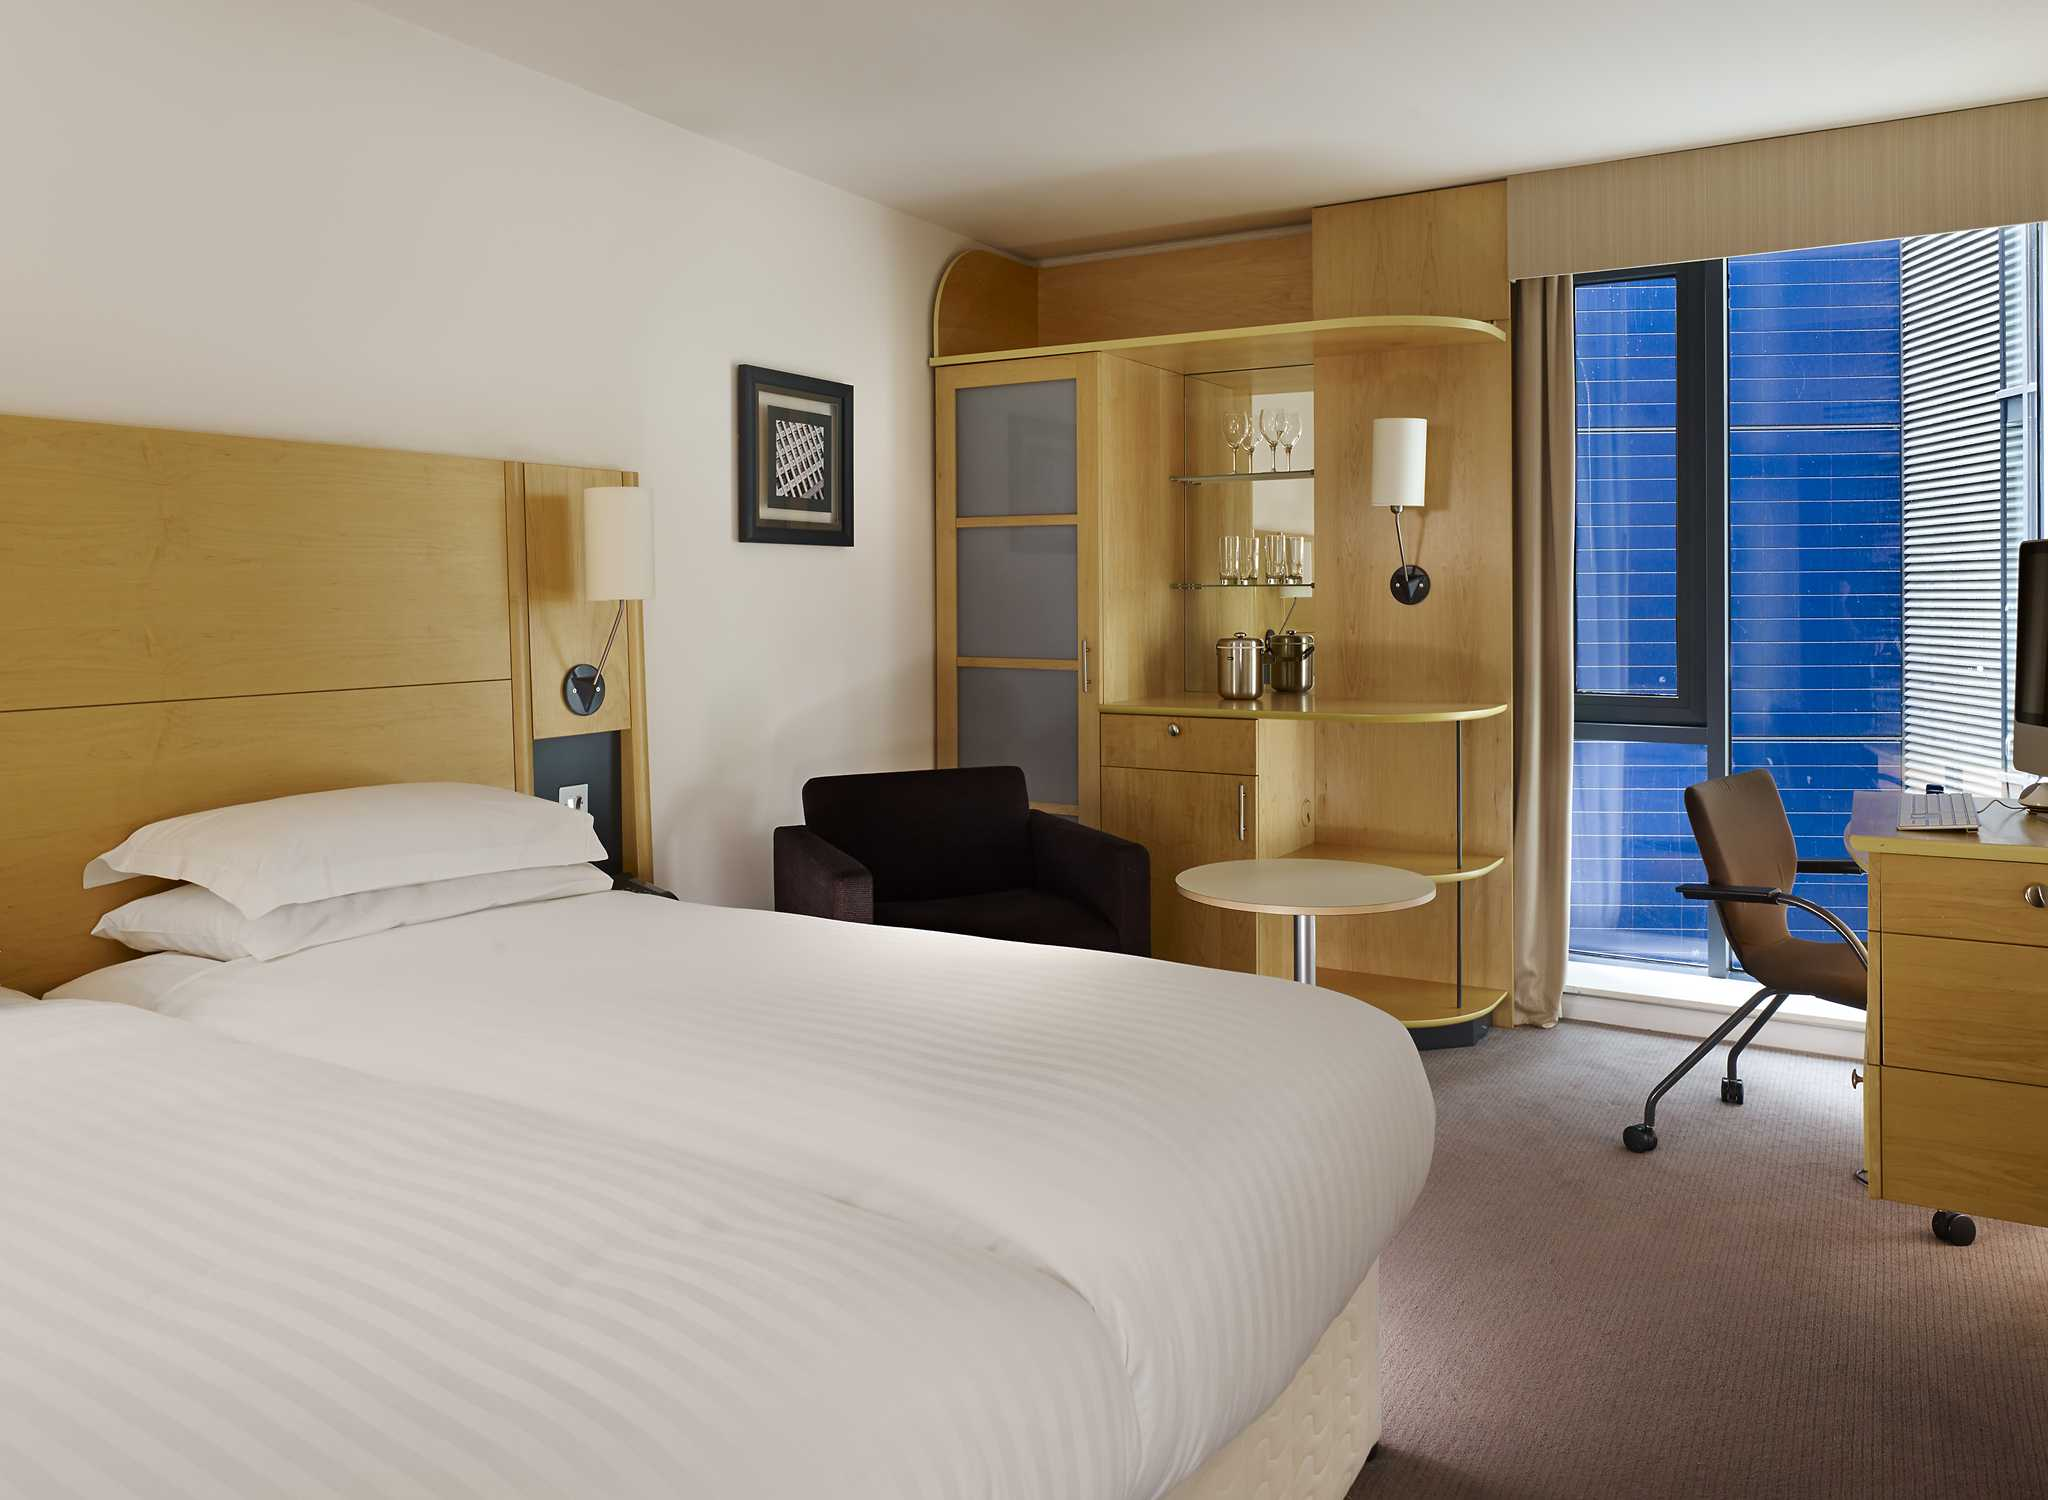 hilton hotels resorts reino unido. Black Bedroom Furniture Sets. Home Design Ideas